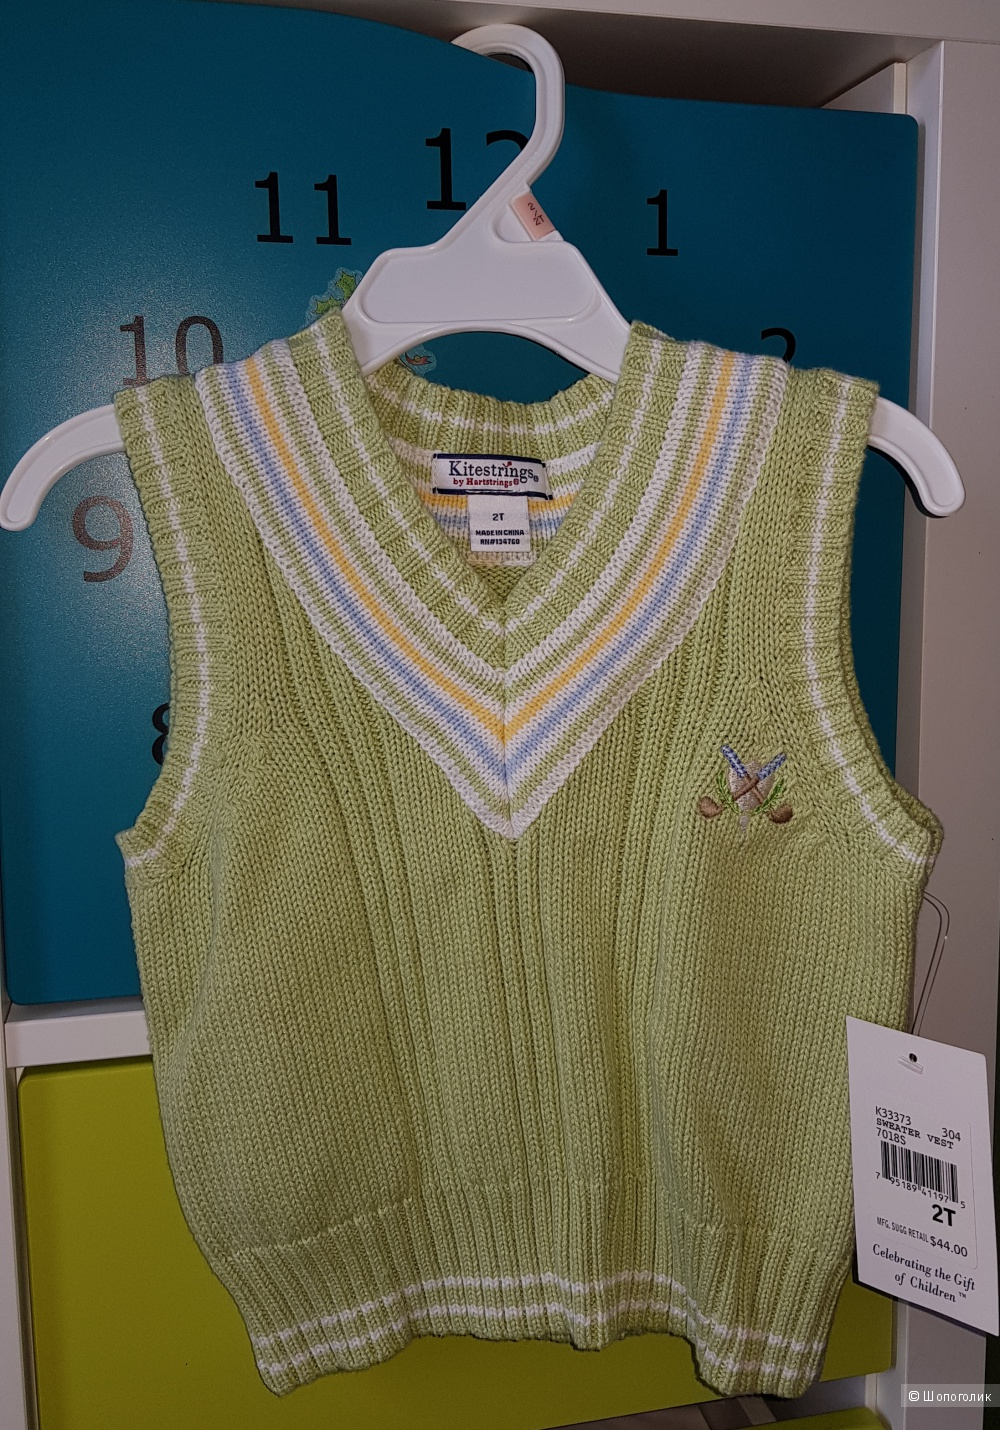 Жилетка Kitestrings Boys 2-7 Toddler Cable Knit Sweater Vest, Leaf Green, 2 года